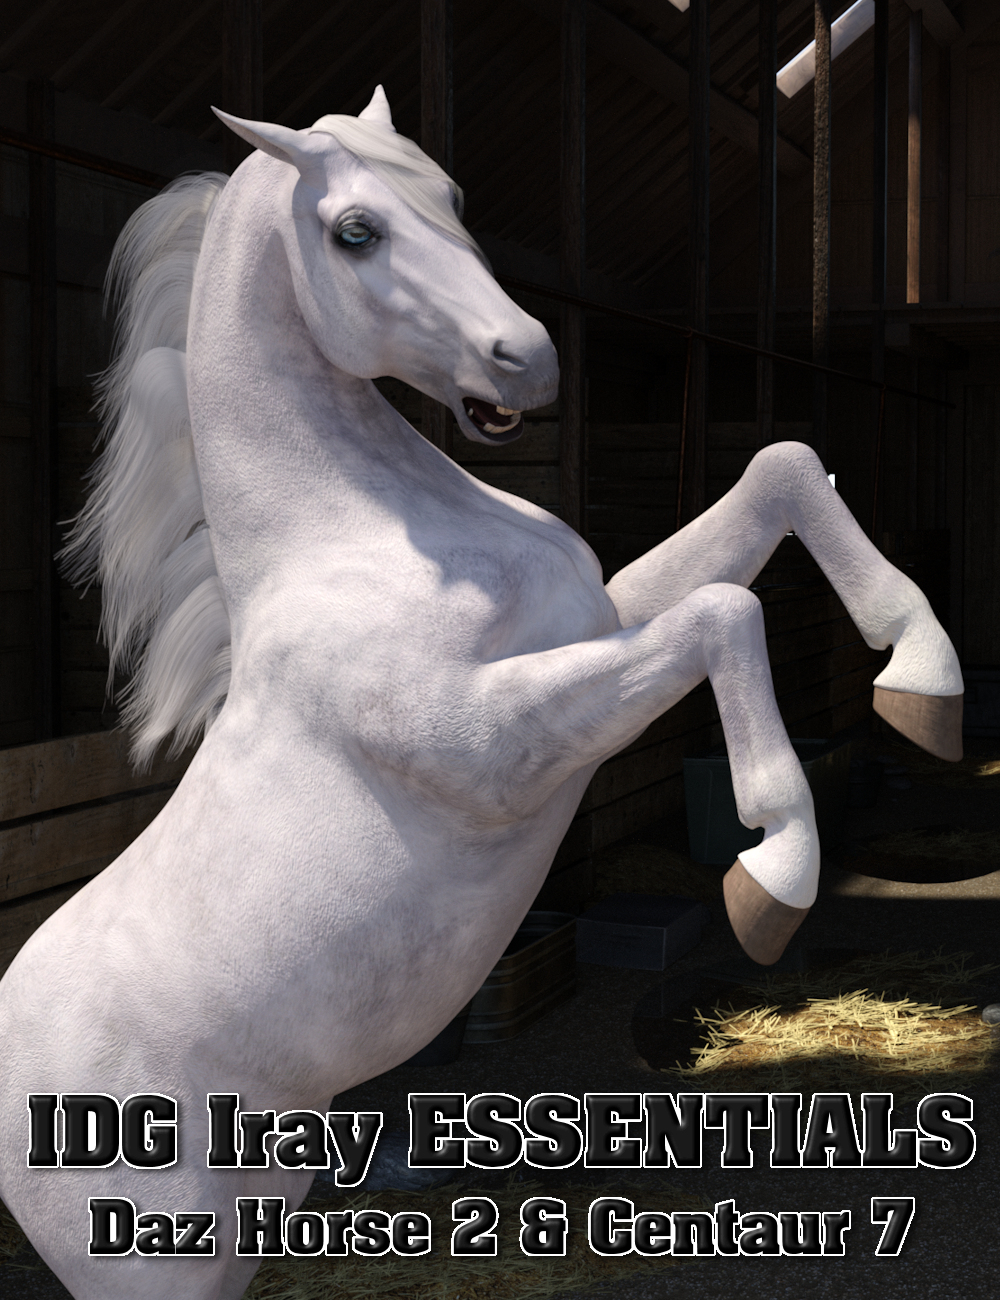 IDG Iray Essentials - Daz Horse 2 and Centaur 7 by: IDG DesignsDestinysGardenInaneGlory, 3D Models by Daz 3D